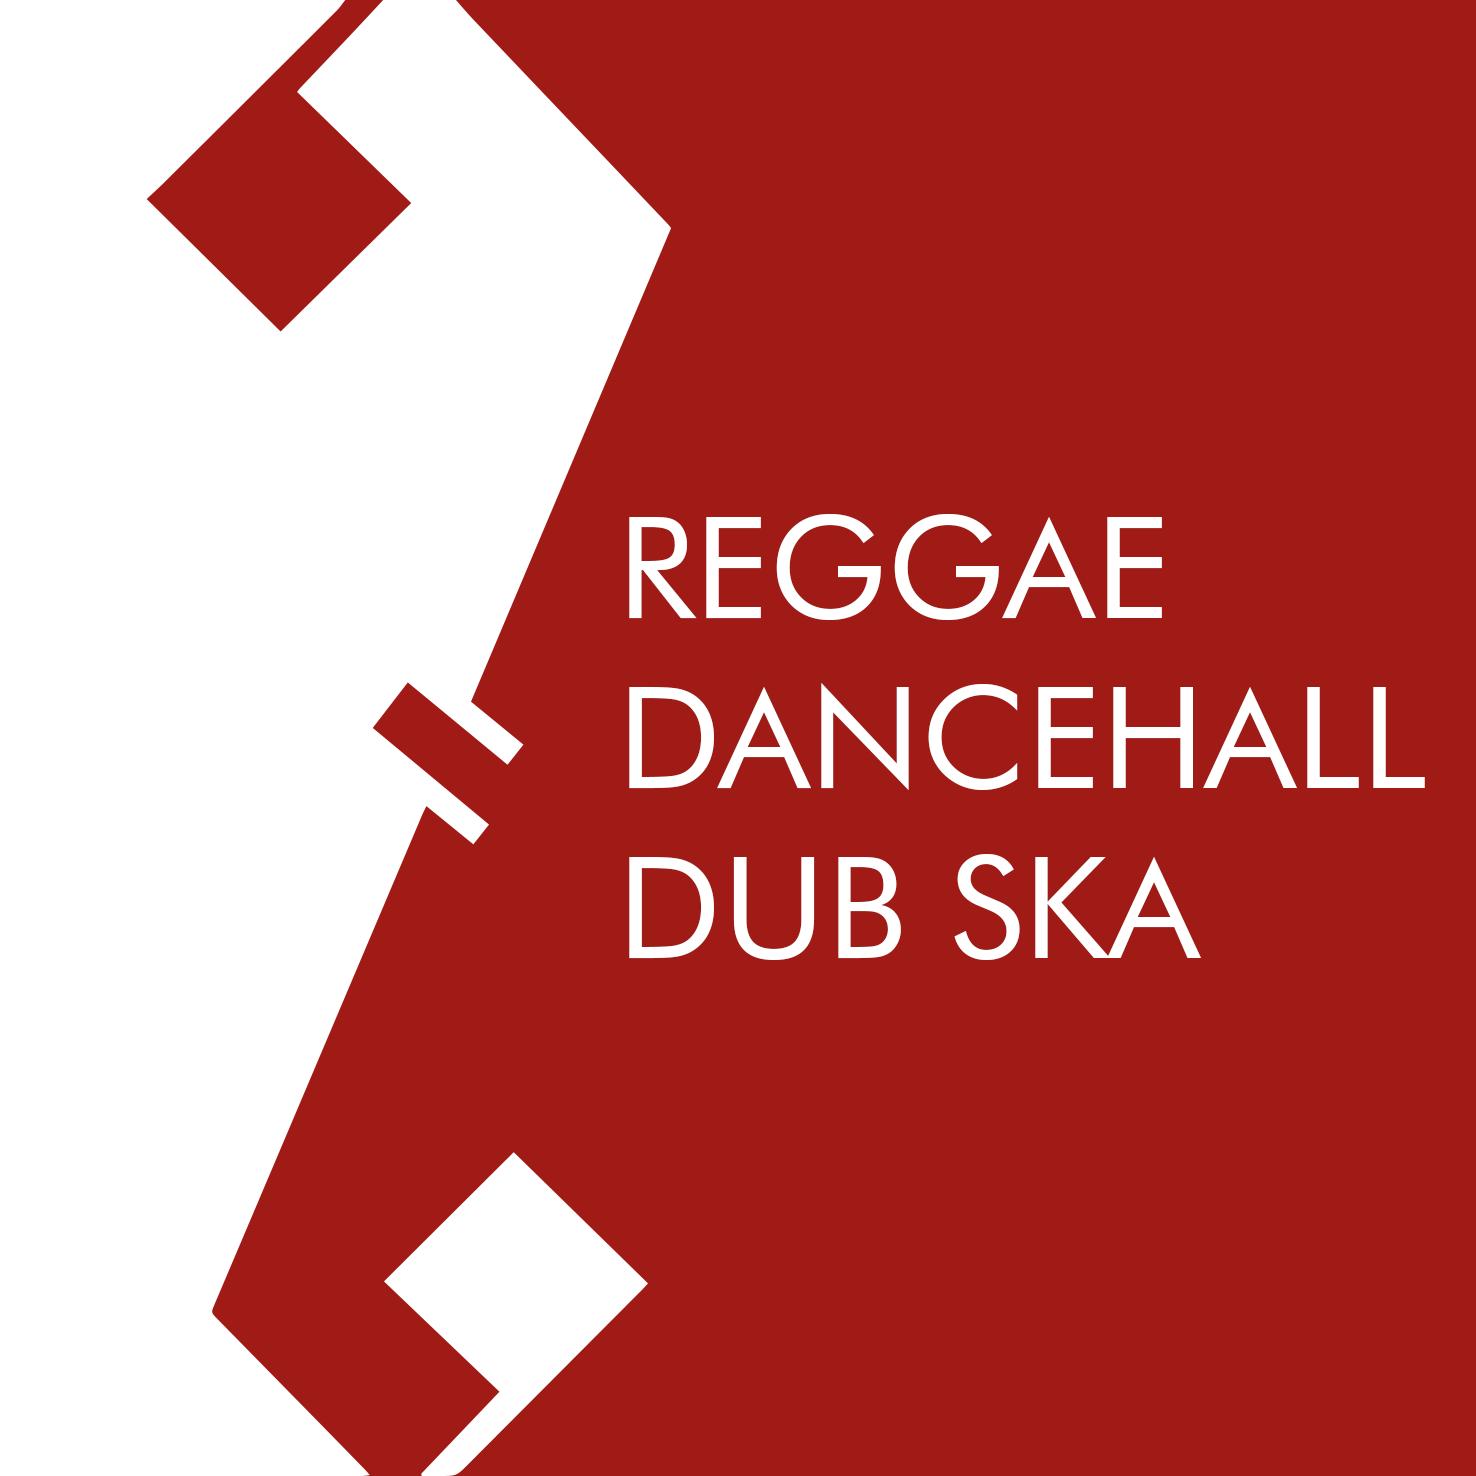 REGGAE - DANCEHALL - DUB - SKA